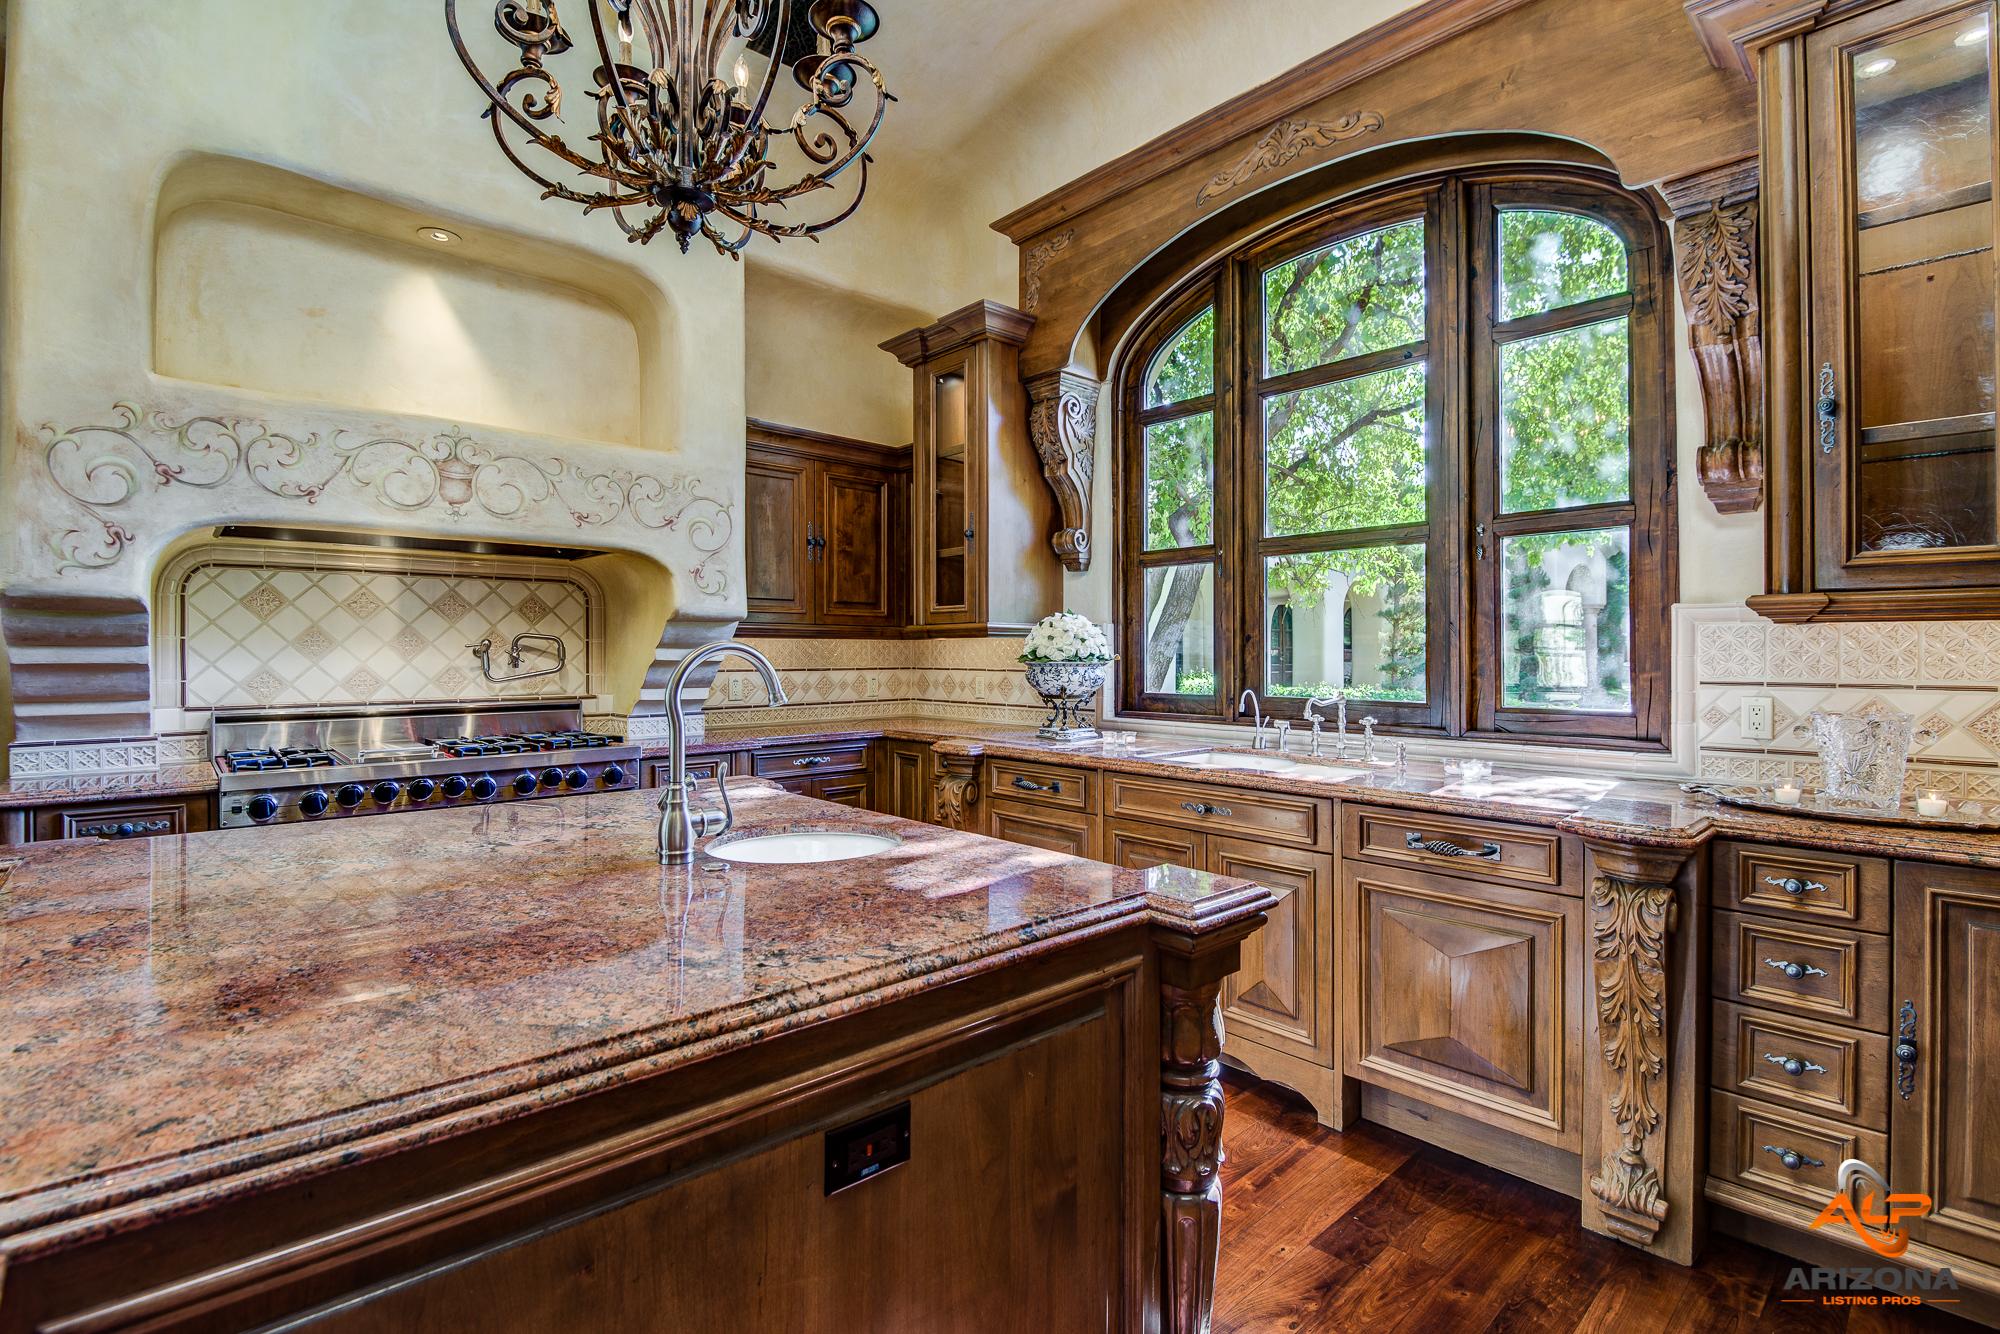 7533 North 70th Street, Paradise Valley, Arizona, DSC_6102, Interior Real Estate Photography.jpg